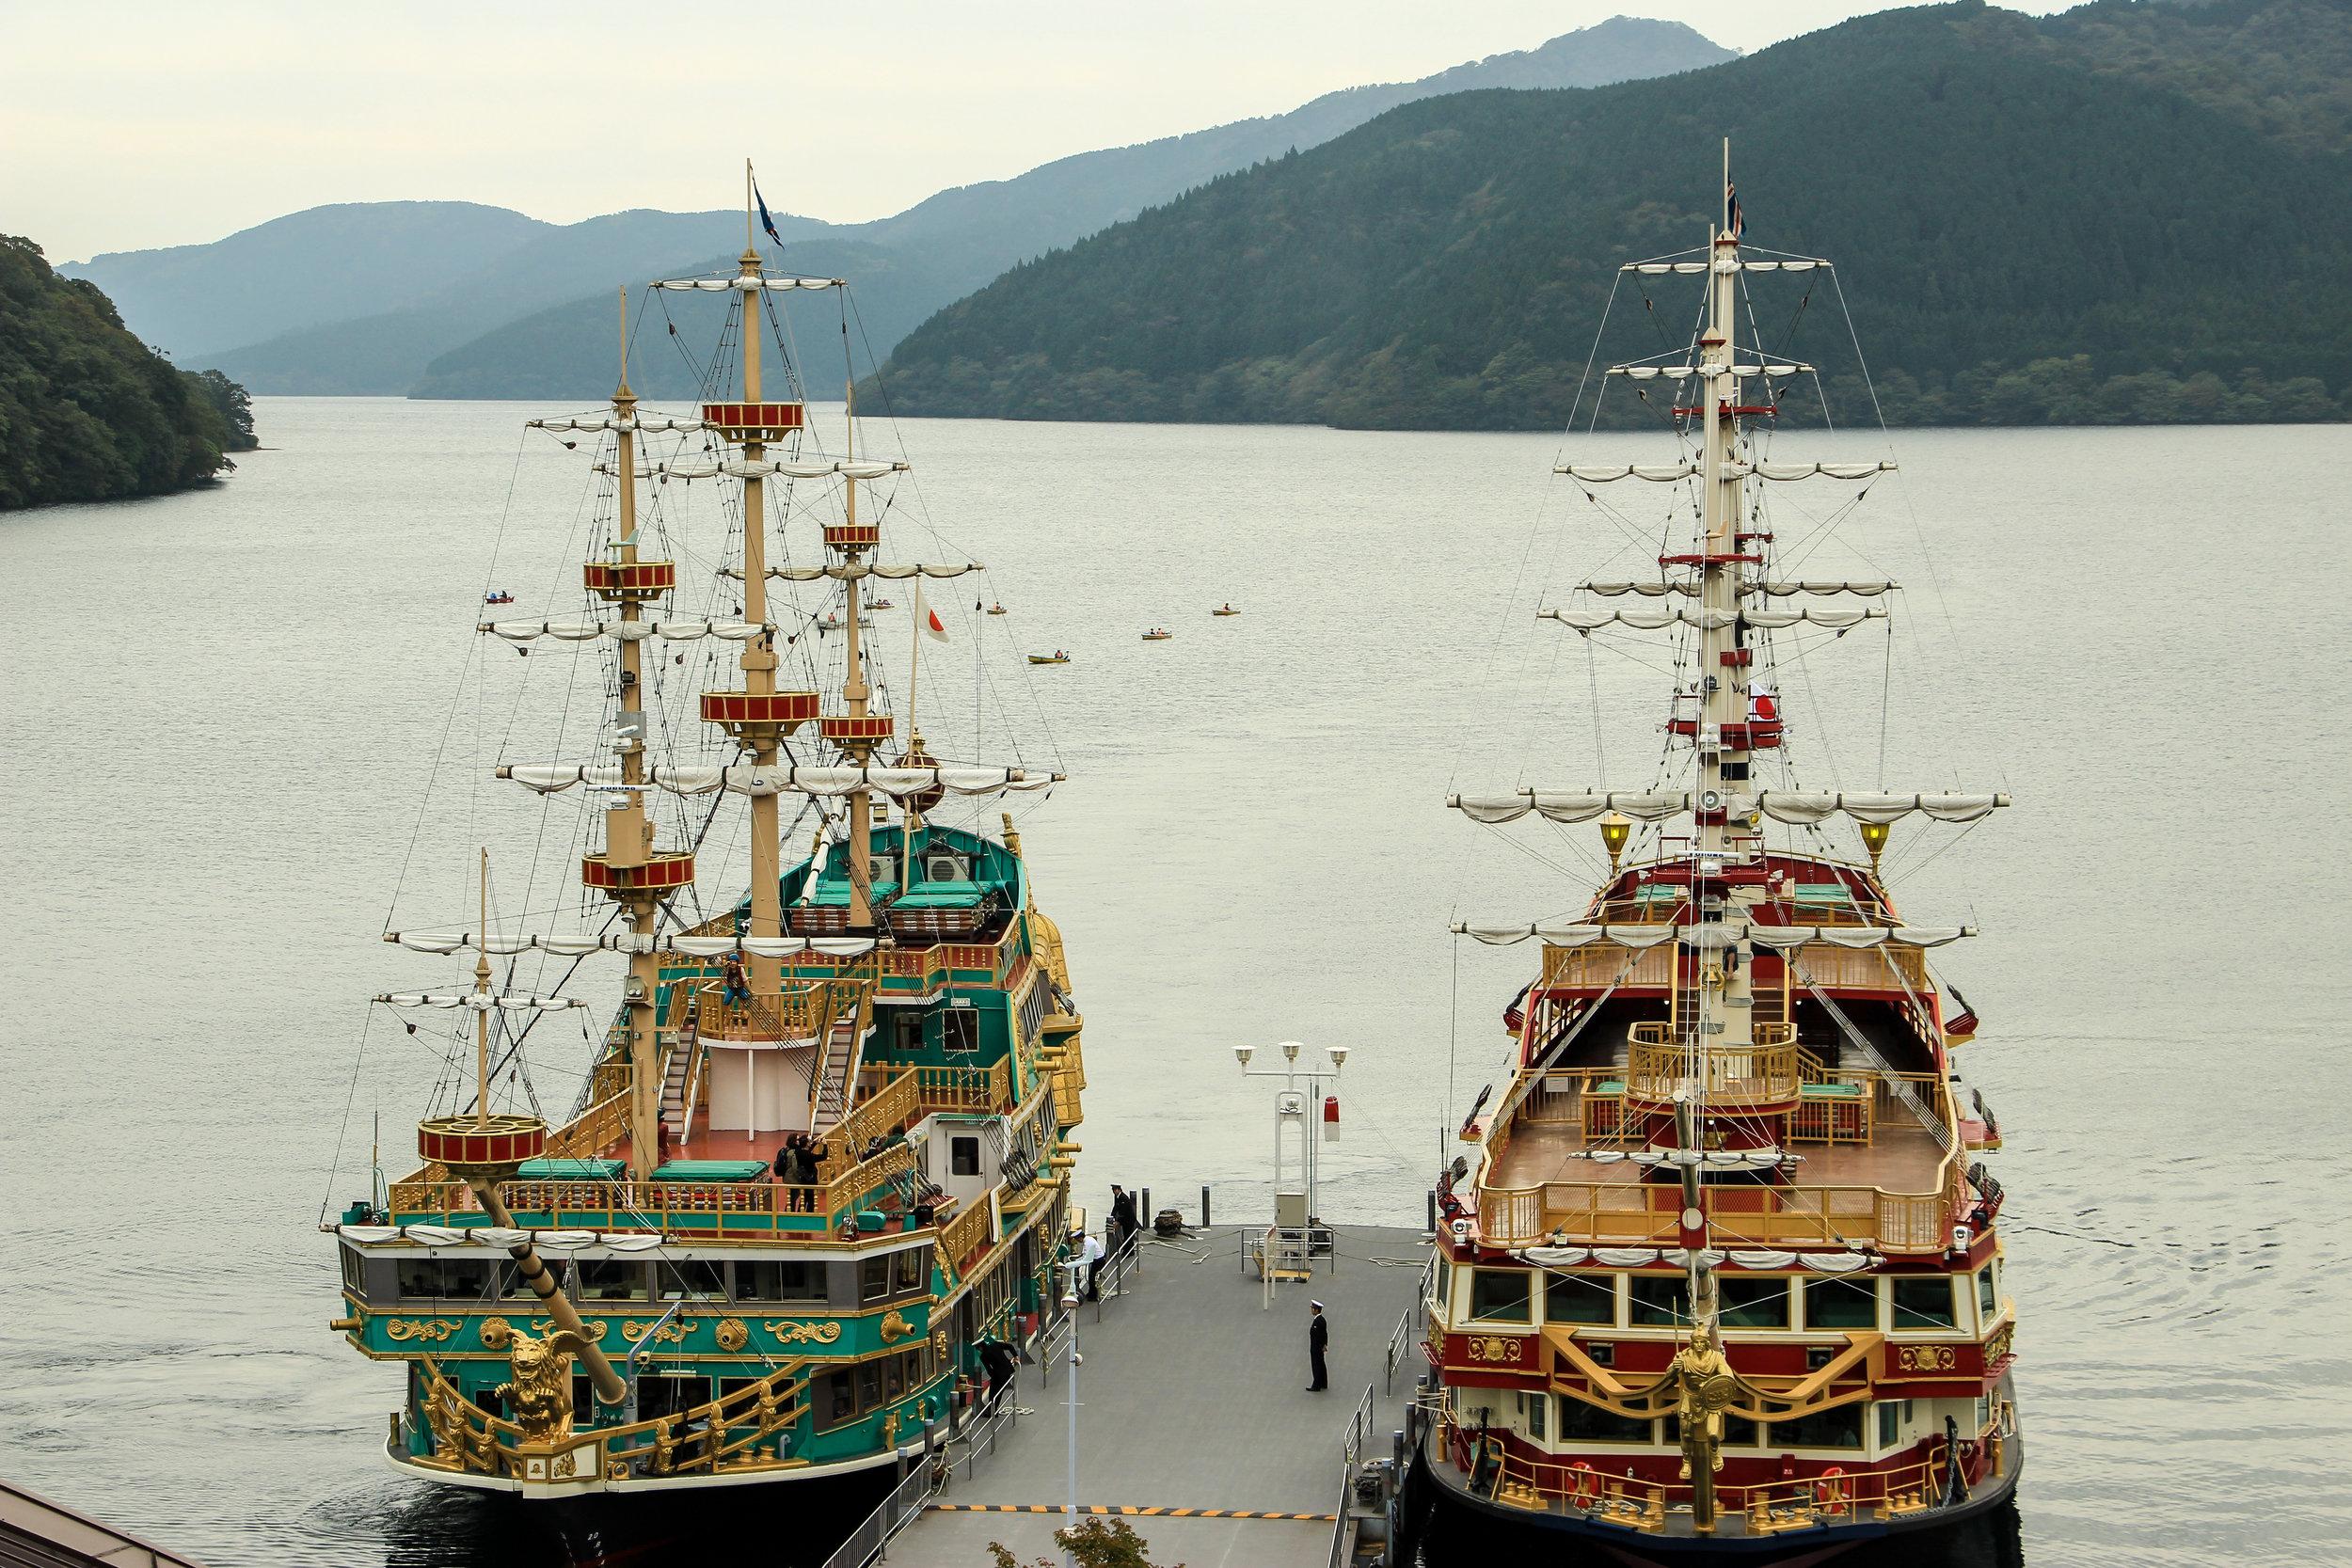 Hakone In A Simple Way Like That | Lake Ashi, Fuji-Hakone-Izu National Park, Japan, Asia | DoLessGetMoreDone.com |